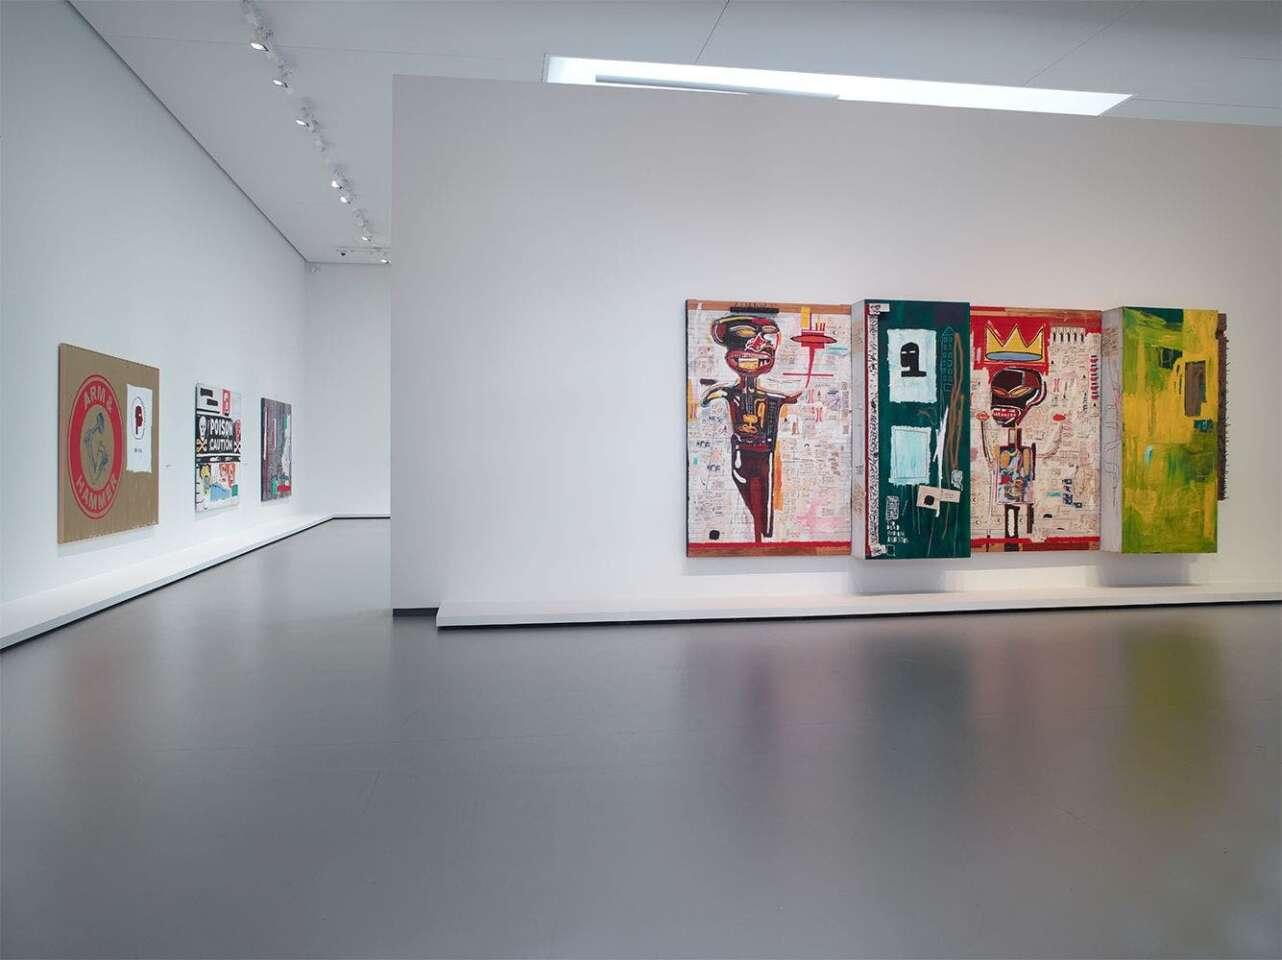 Exposición Jean Michel Basquiat. Fundación Louis Vuitton, Paris.